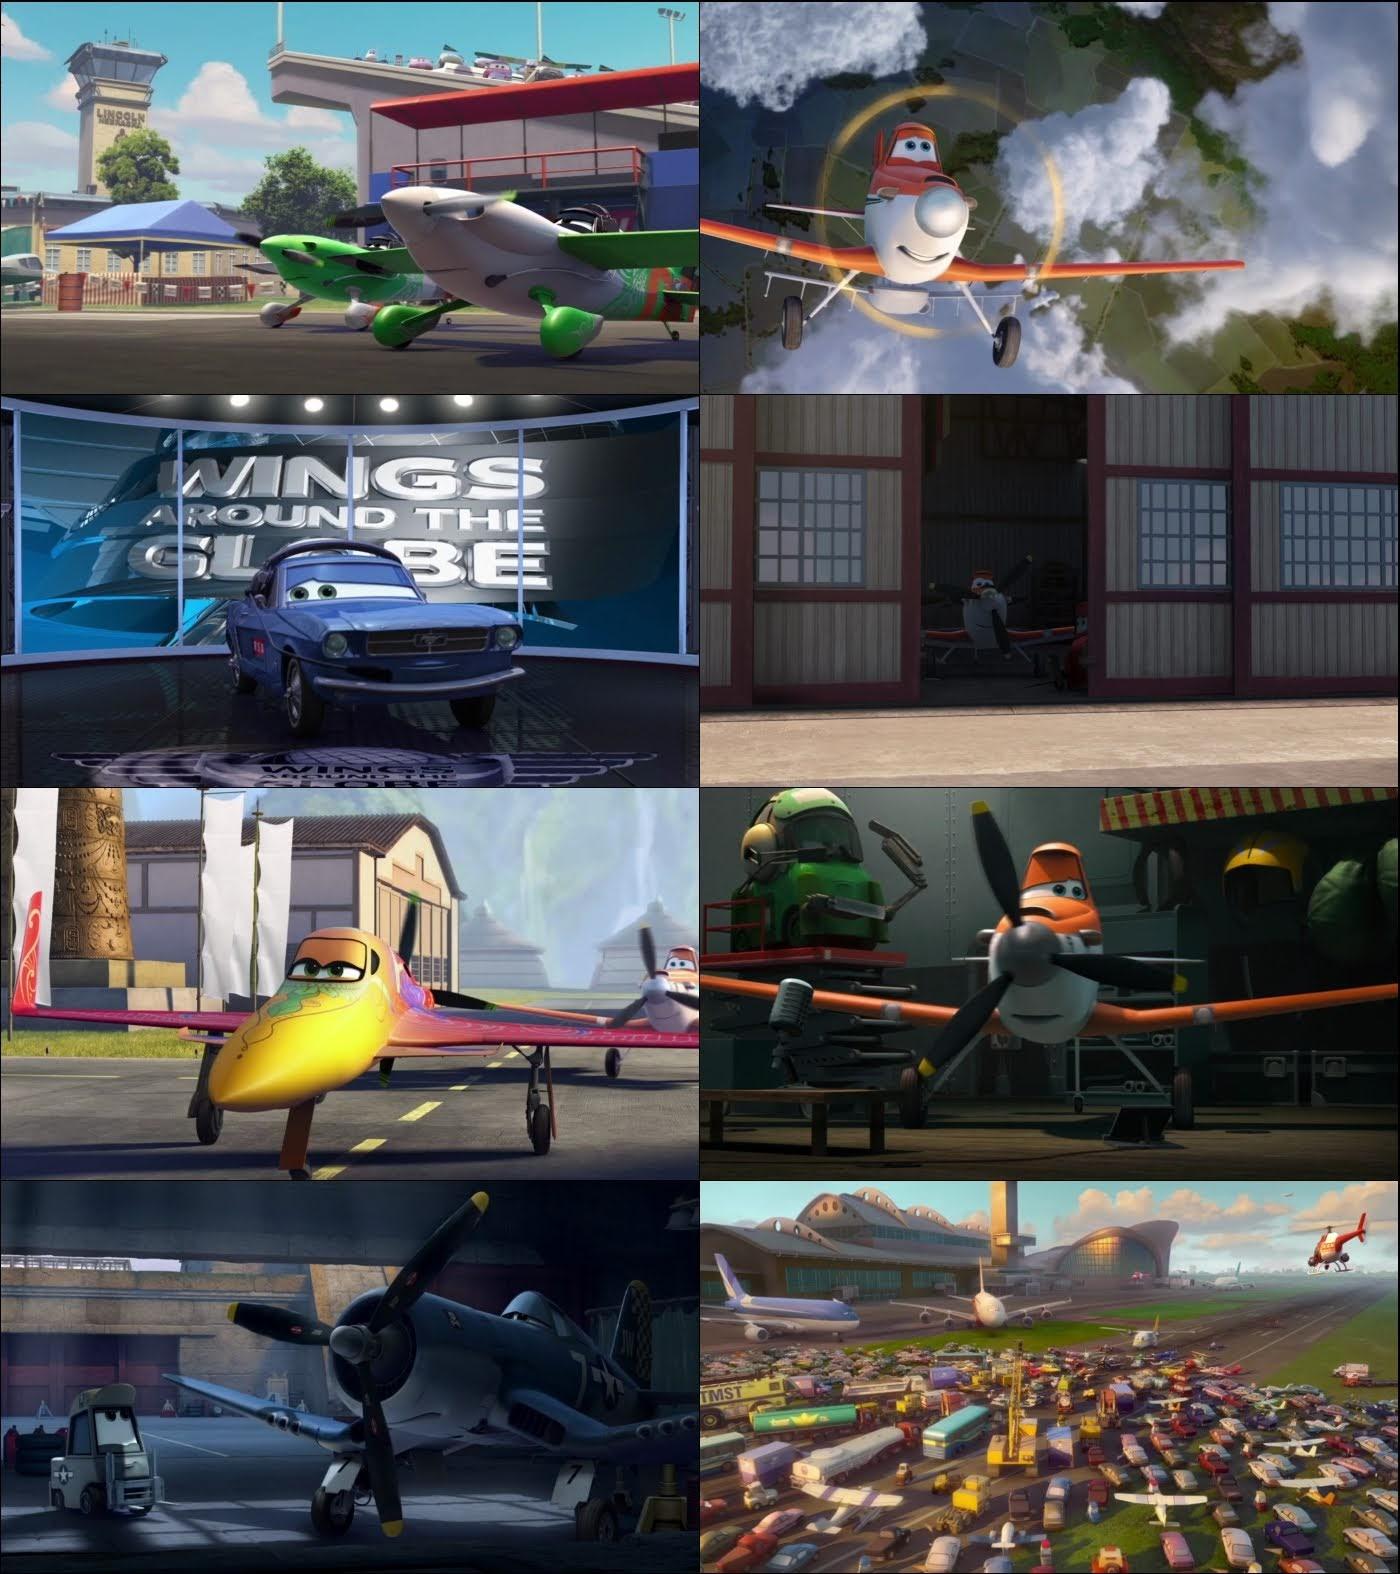 Aviones 1080p Latino